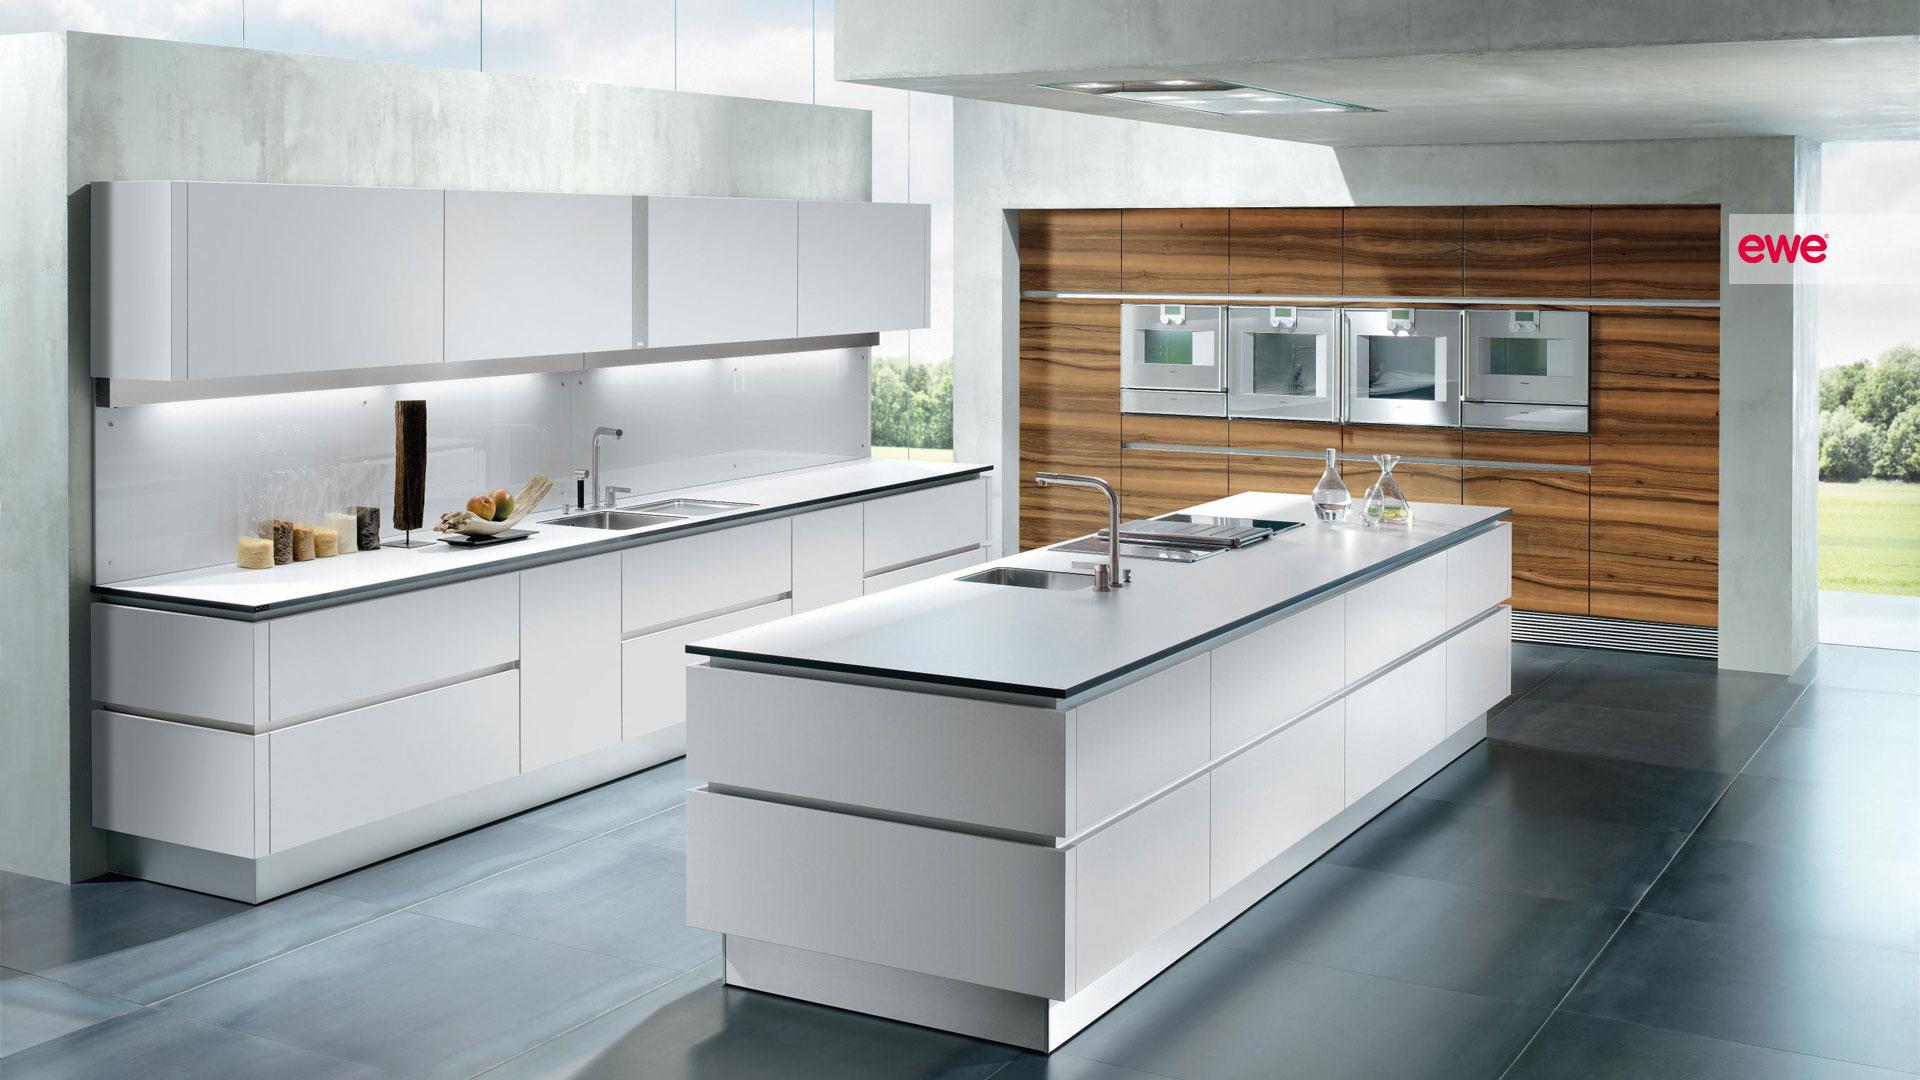 ewe Küchenstudio Leoben